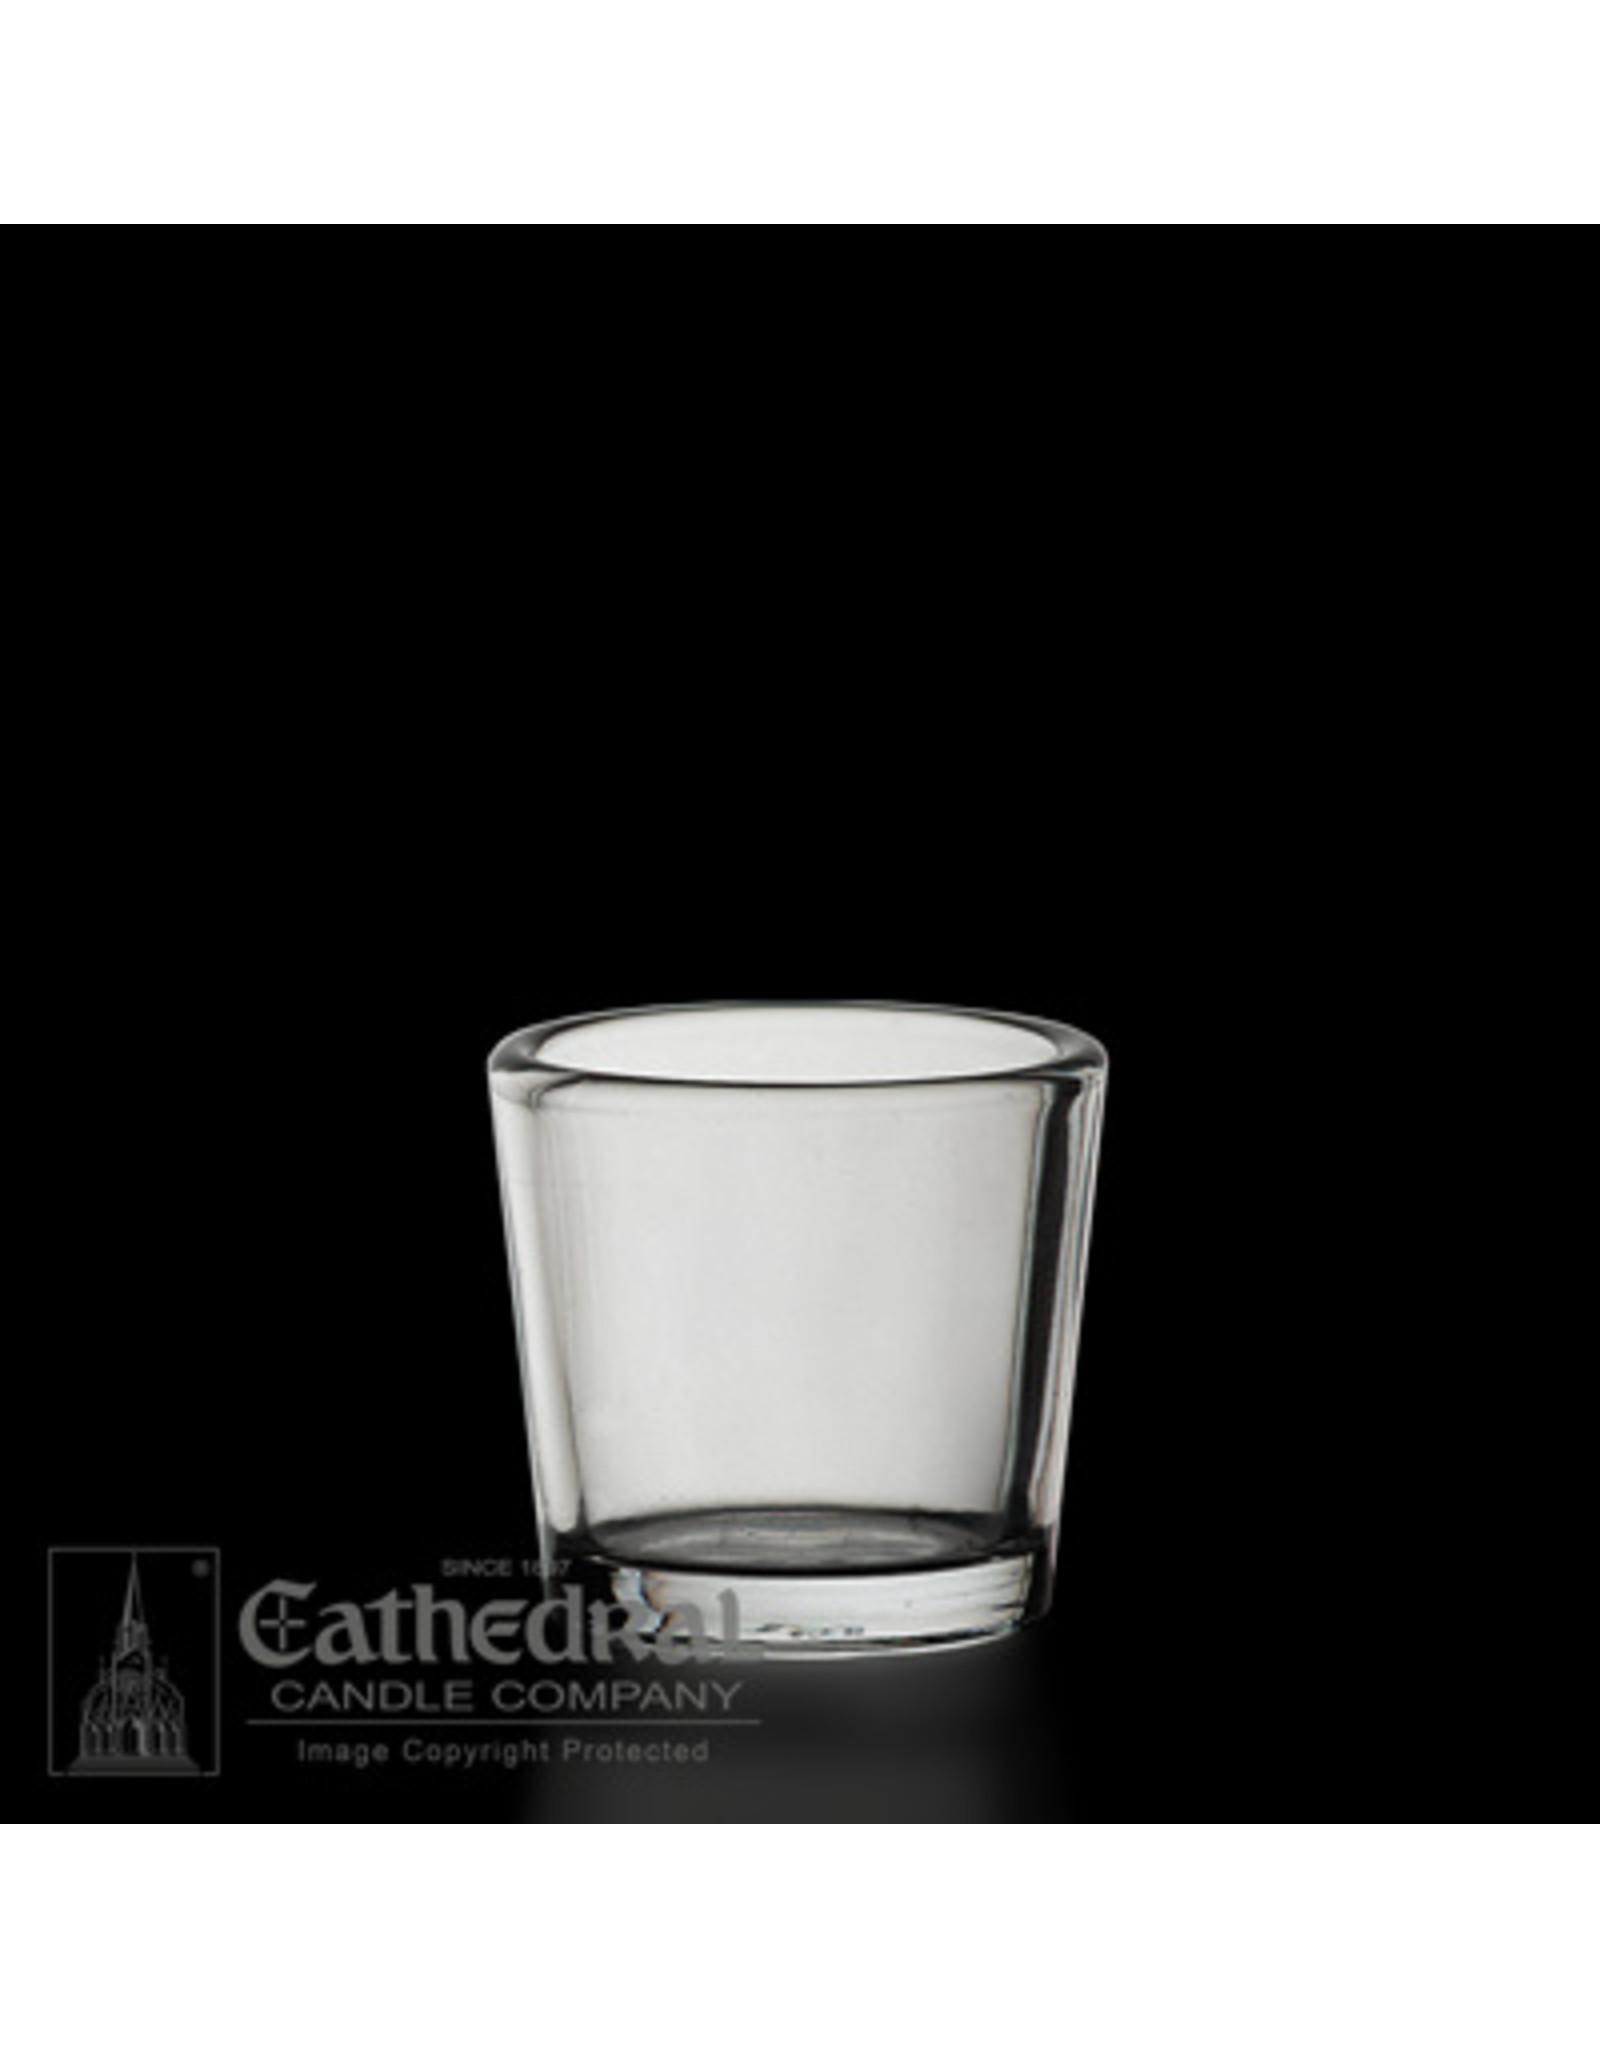 CNDL GLASS VOT 10 HR CLEAR(12)